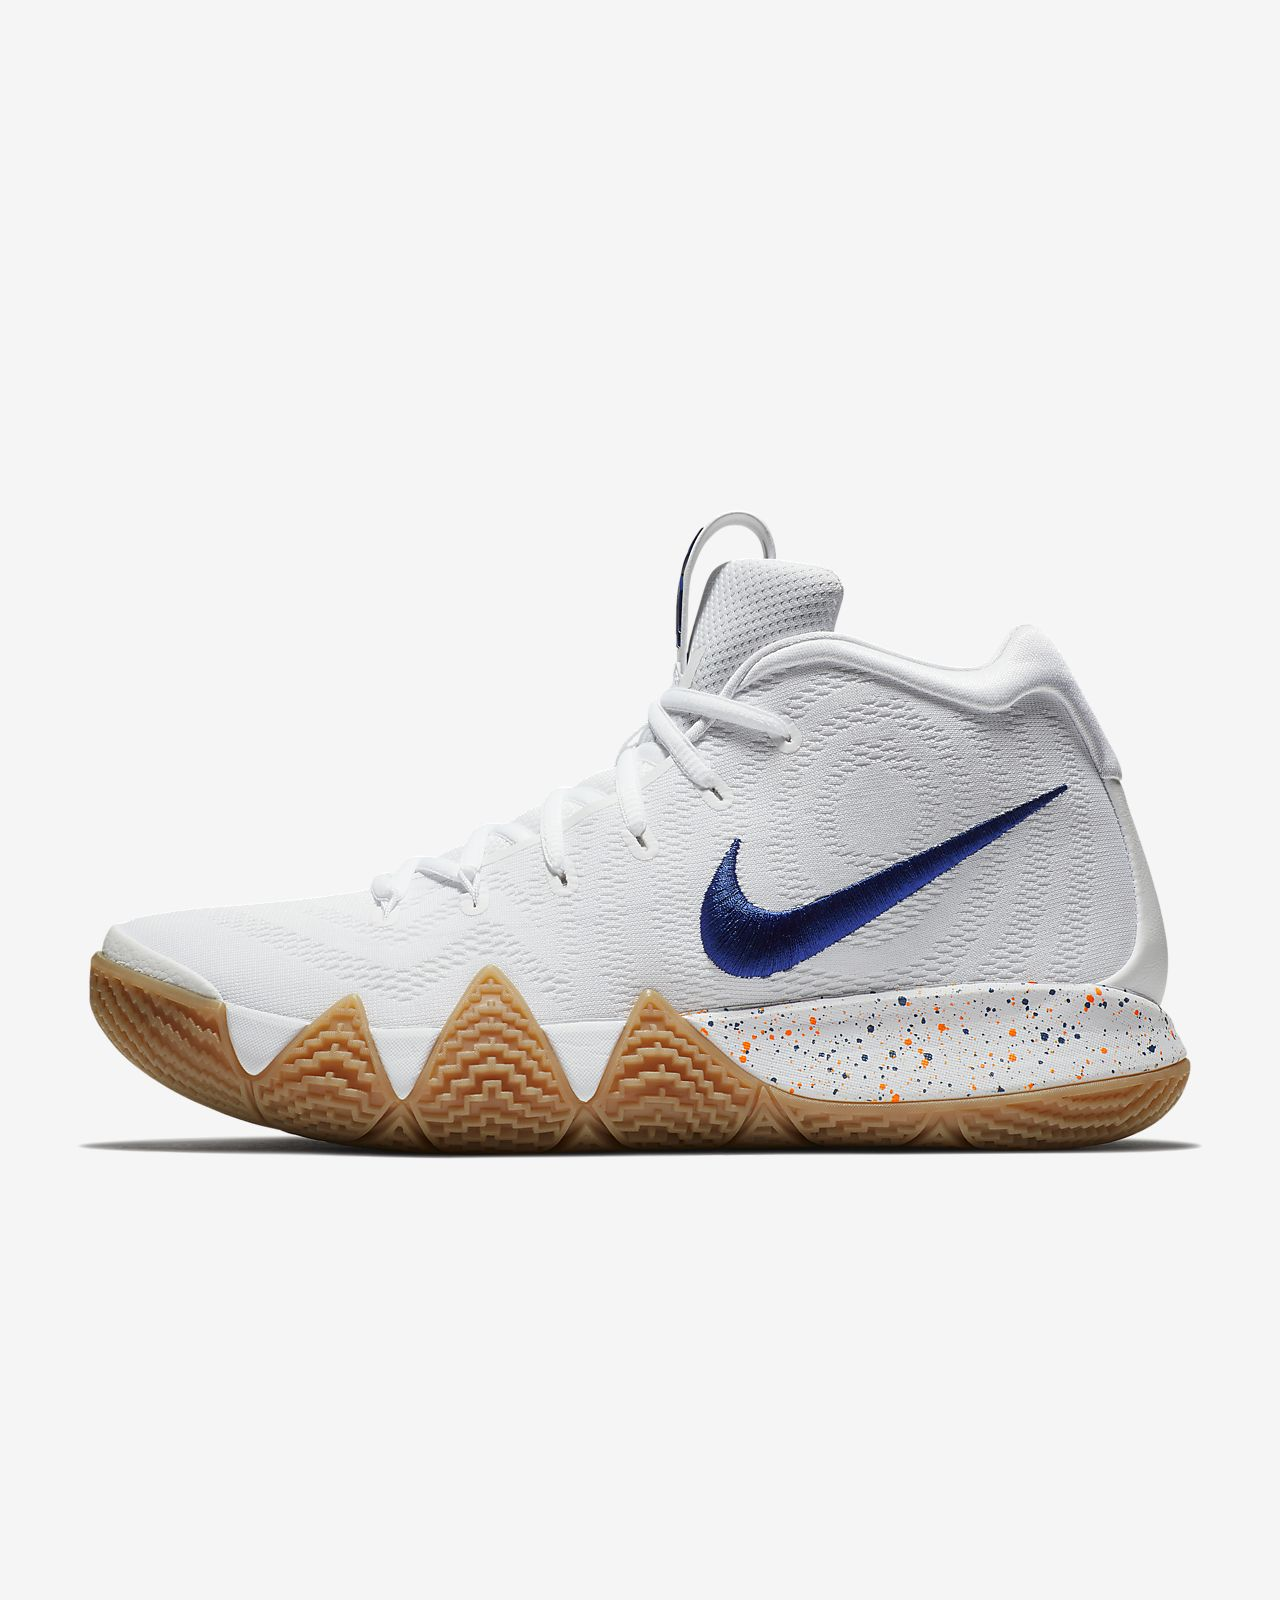 6c83e0bbeea4 ... new zealand kyrie 4 uncle drew basketball shoe 6049c 7ebaf